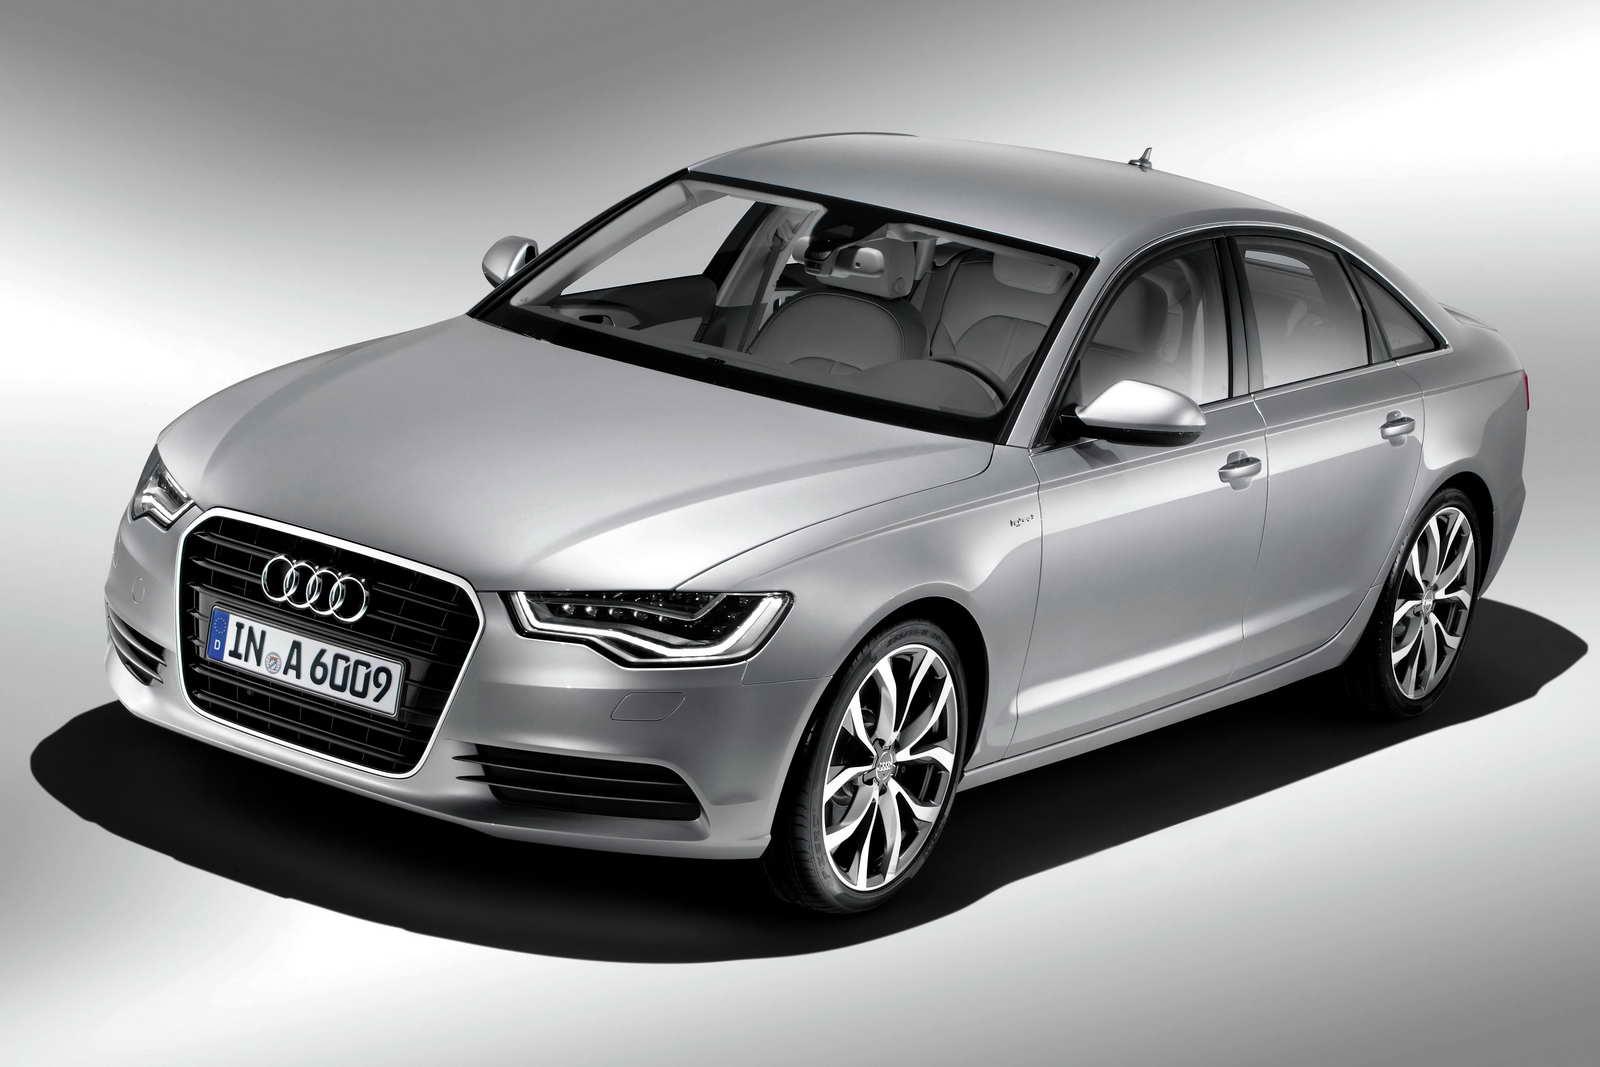 Audi_A6_Hybrid_01